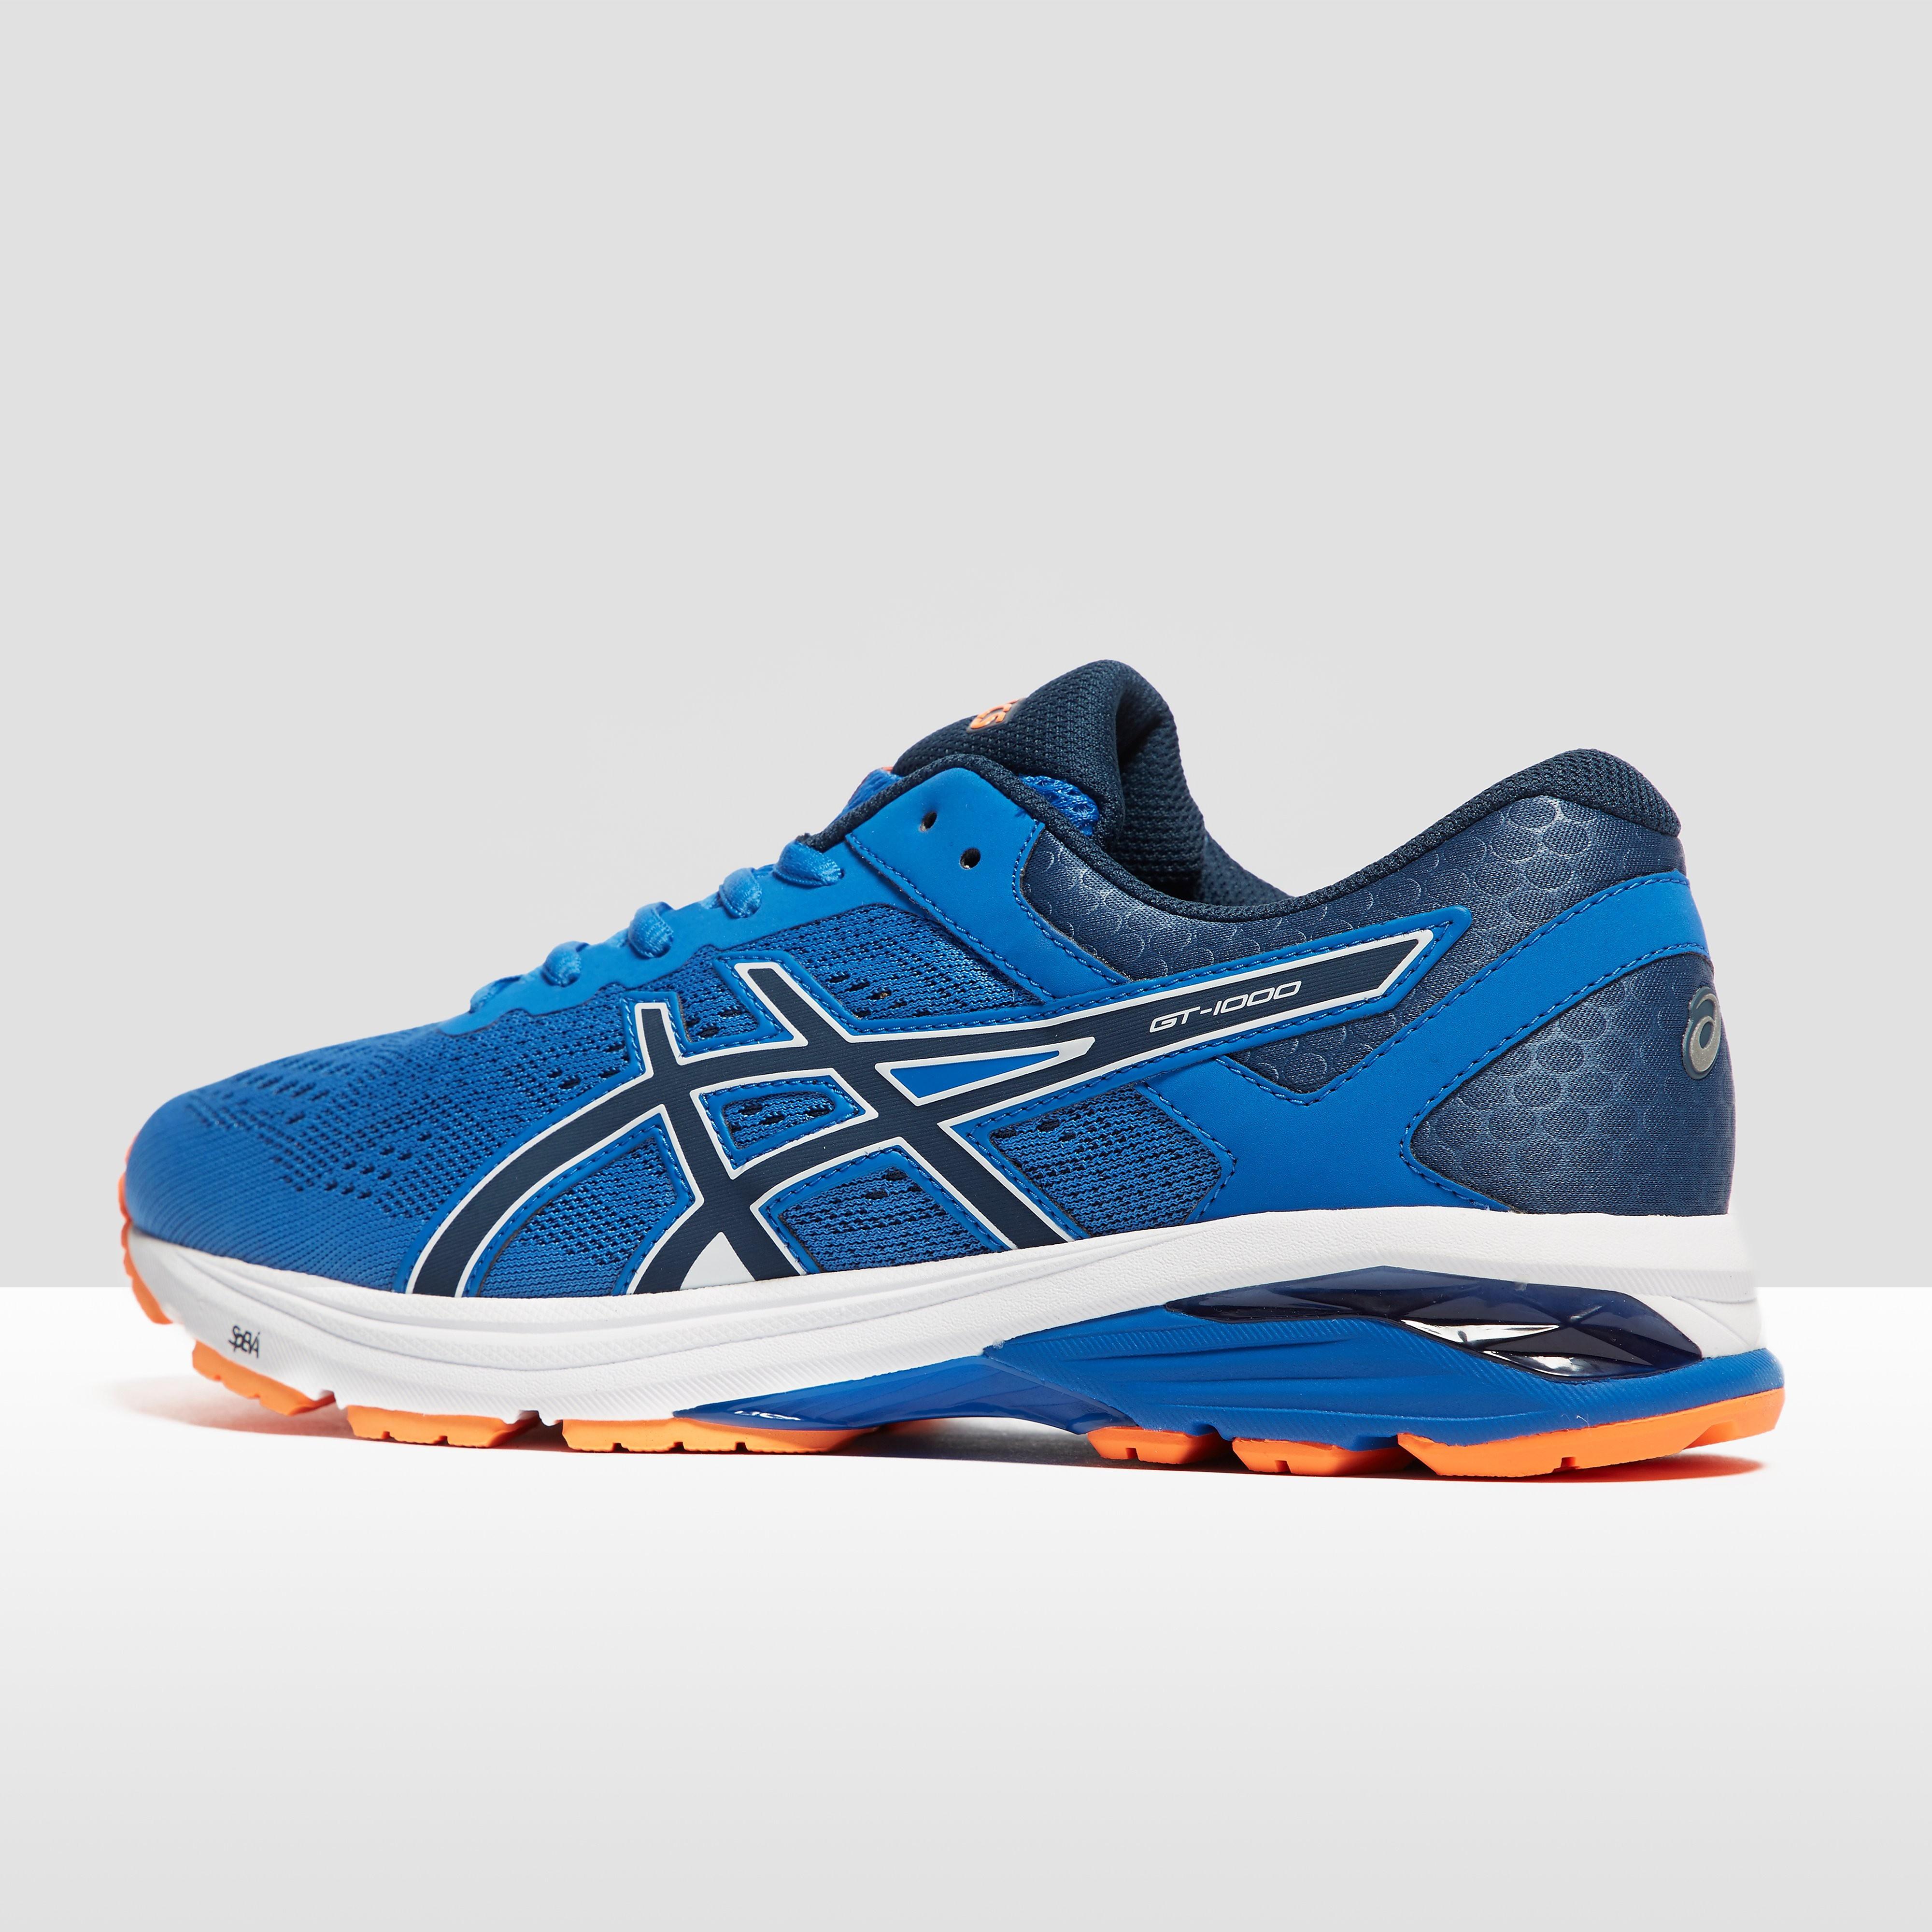 ASICS GT-1000 6 Men's Running Shoes